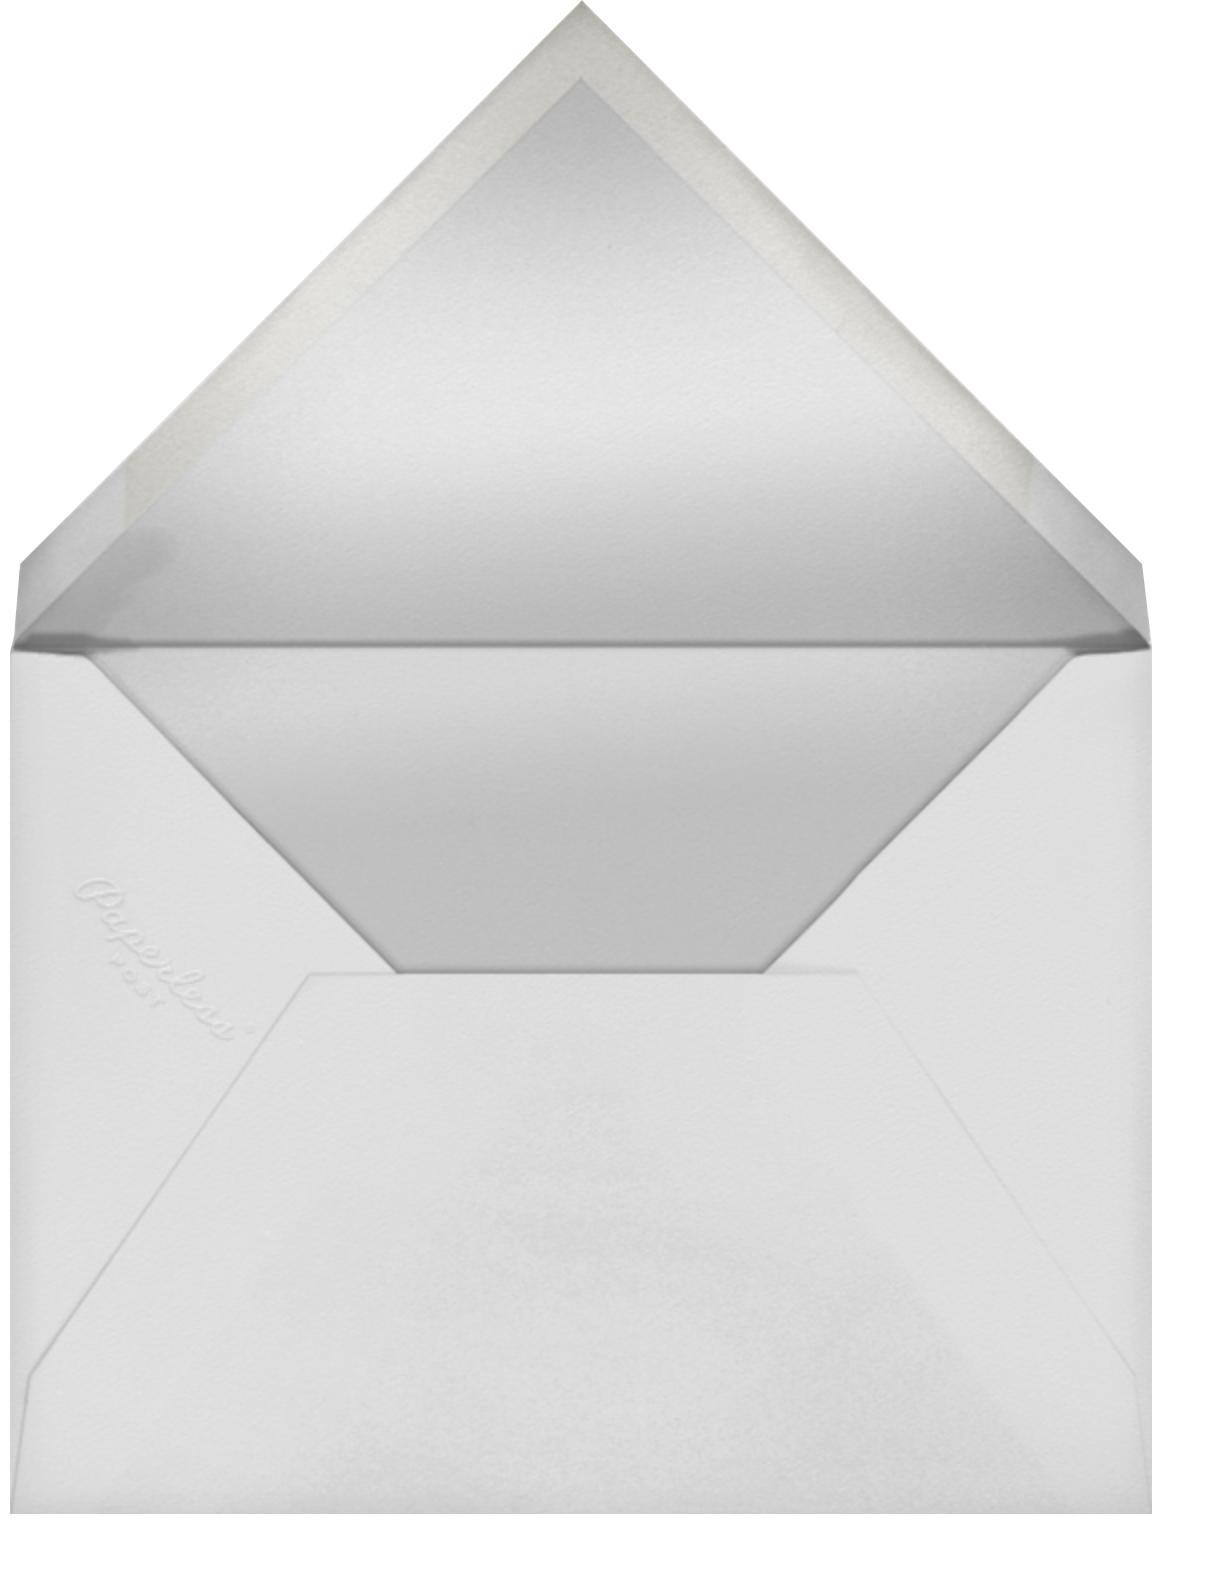 Paris Skyline View (Program) - White/Black - Paperless Post - Menus and programs - envelope back